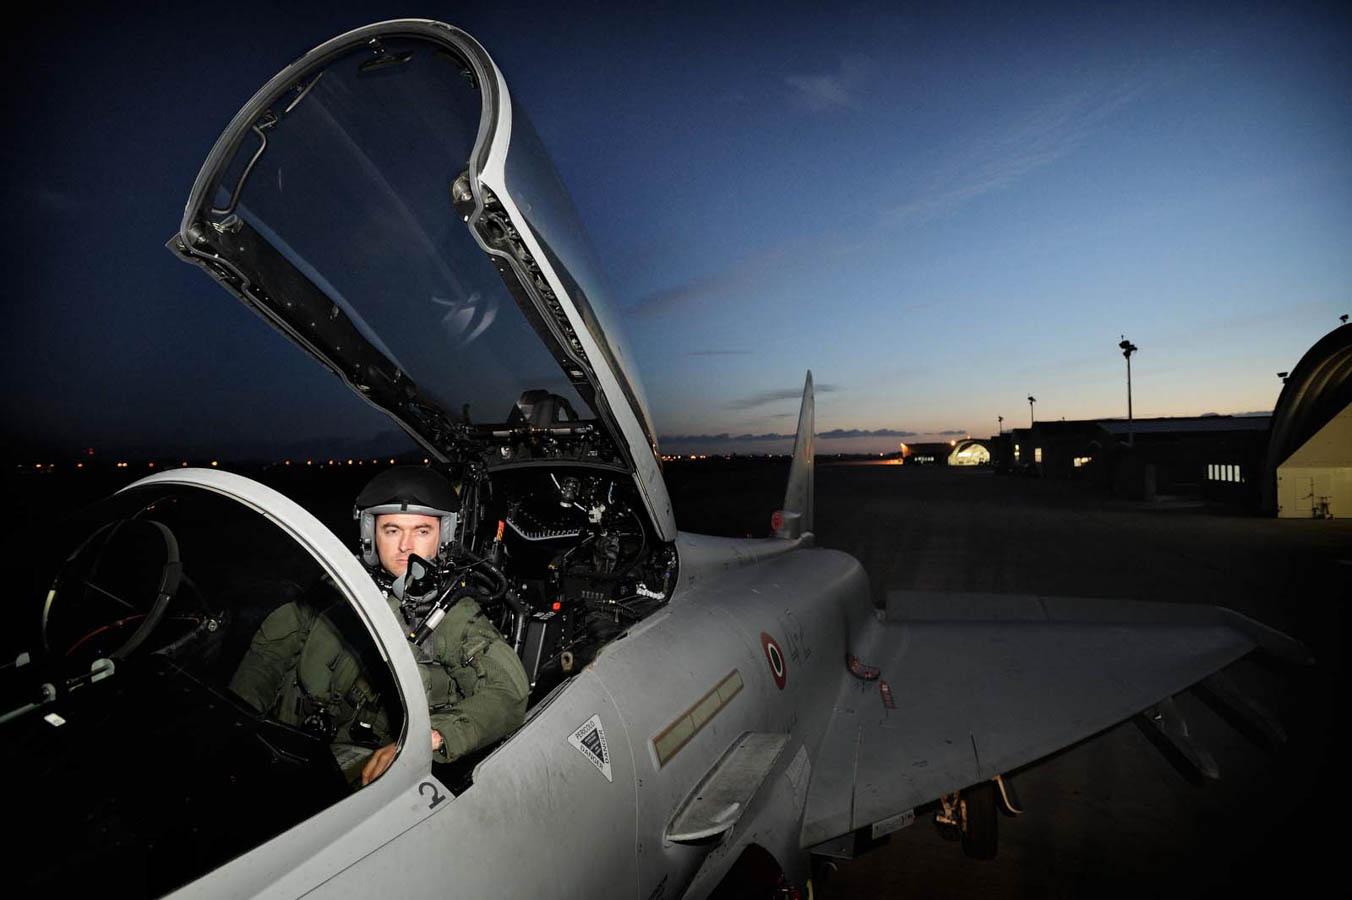 Eurofighter - 4° Stormo Grosseto - Aeronautica Militare